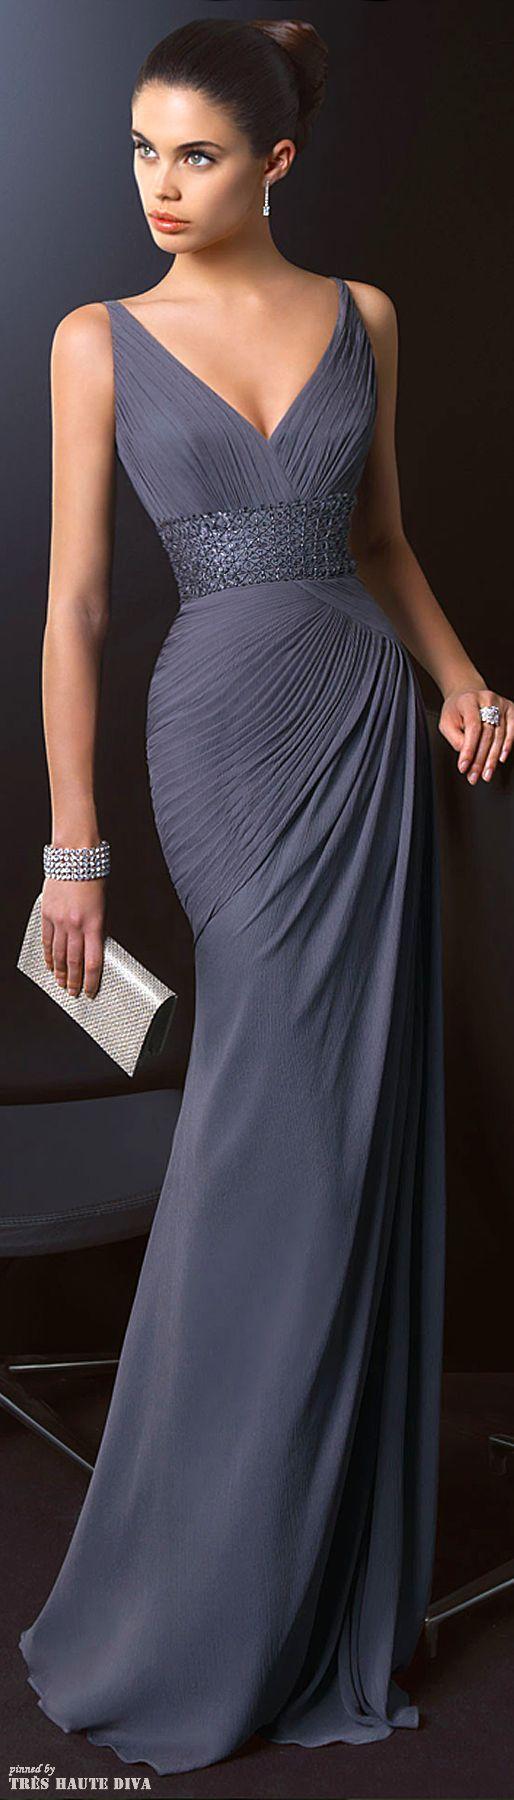 Glamorous Evening Dresses Grey